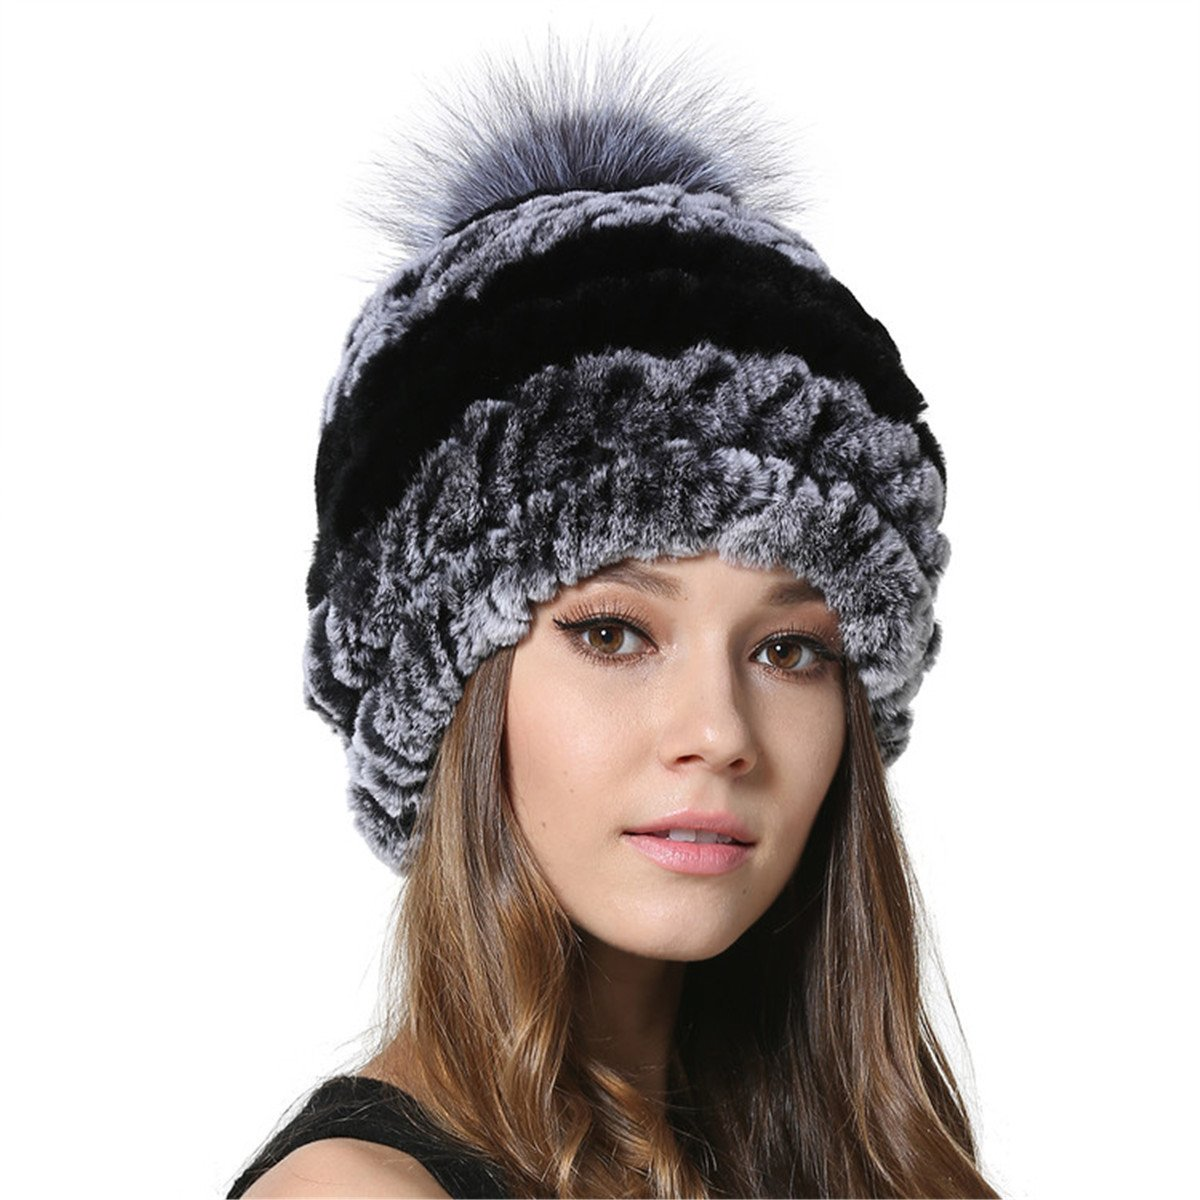 MEEFUR Women Genuine Rex Rabbit Fur Hats Bobble Beanies with Silver Fox Fur Ball OneSize)